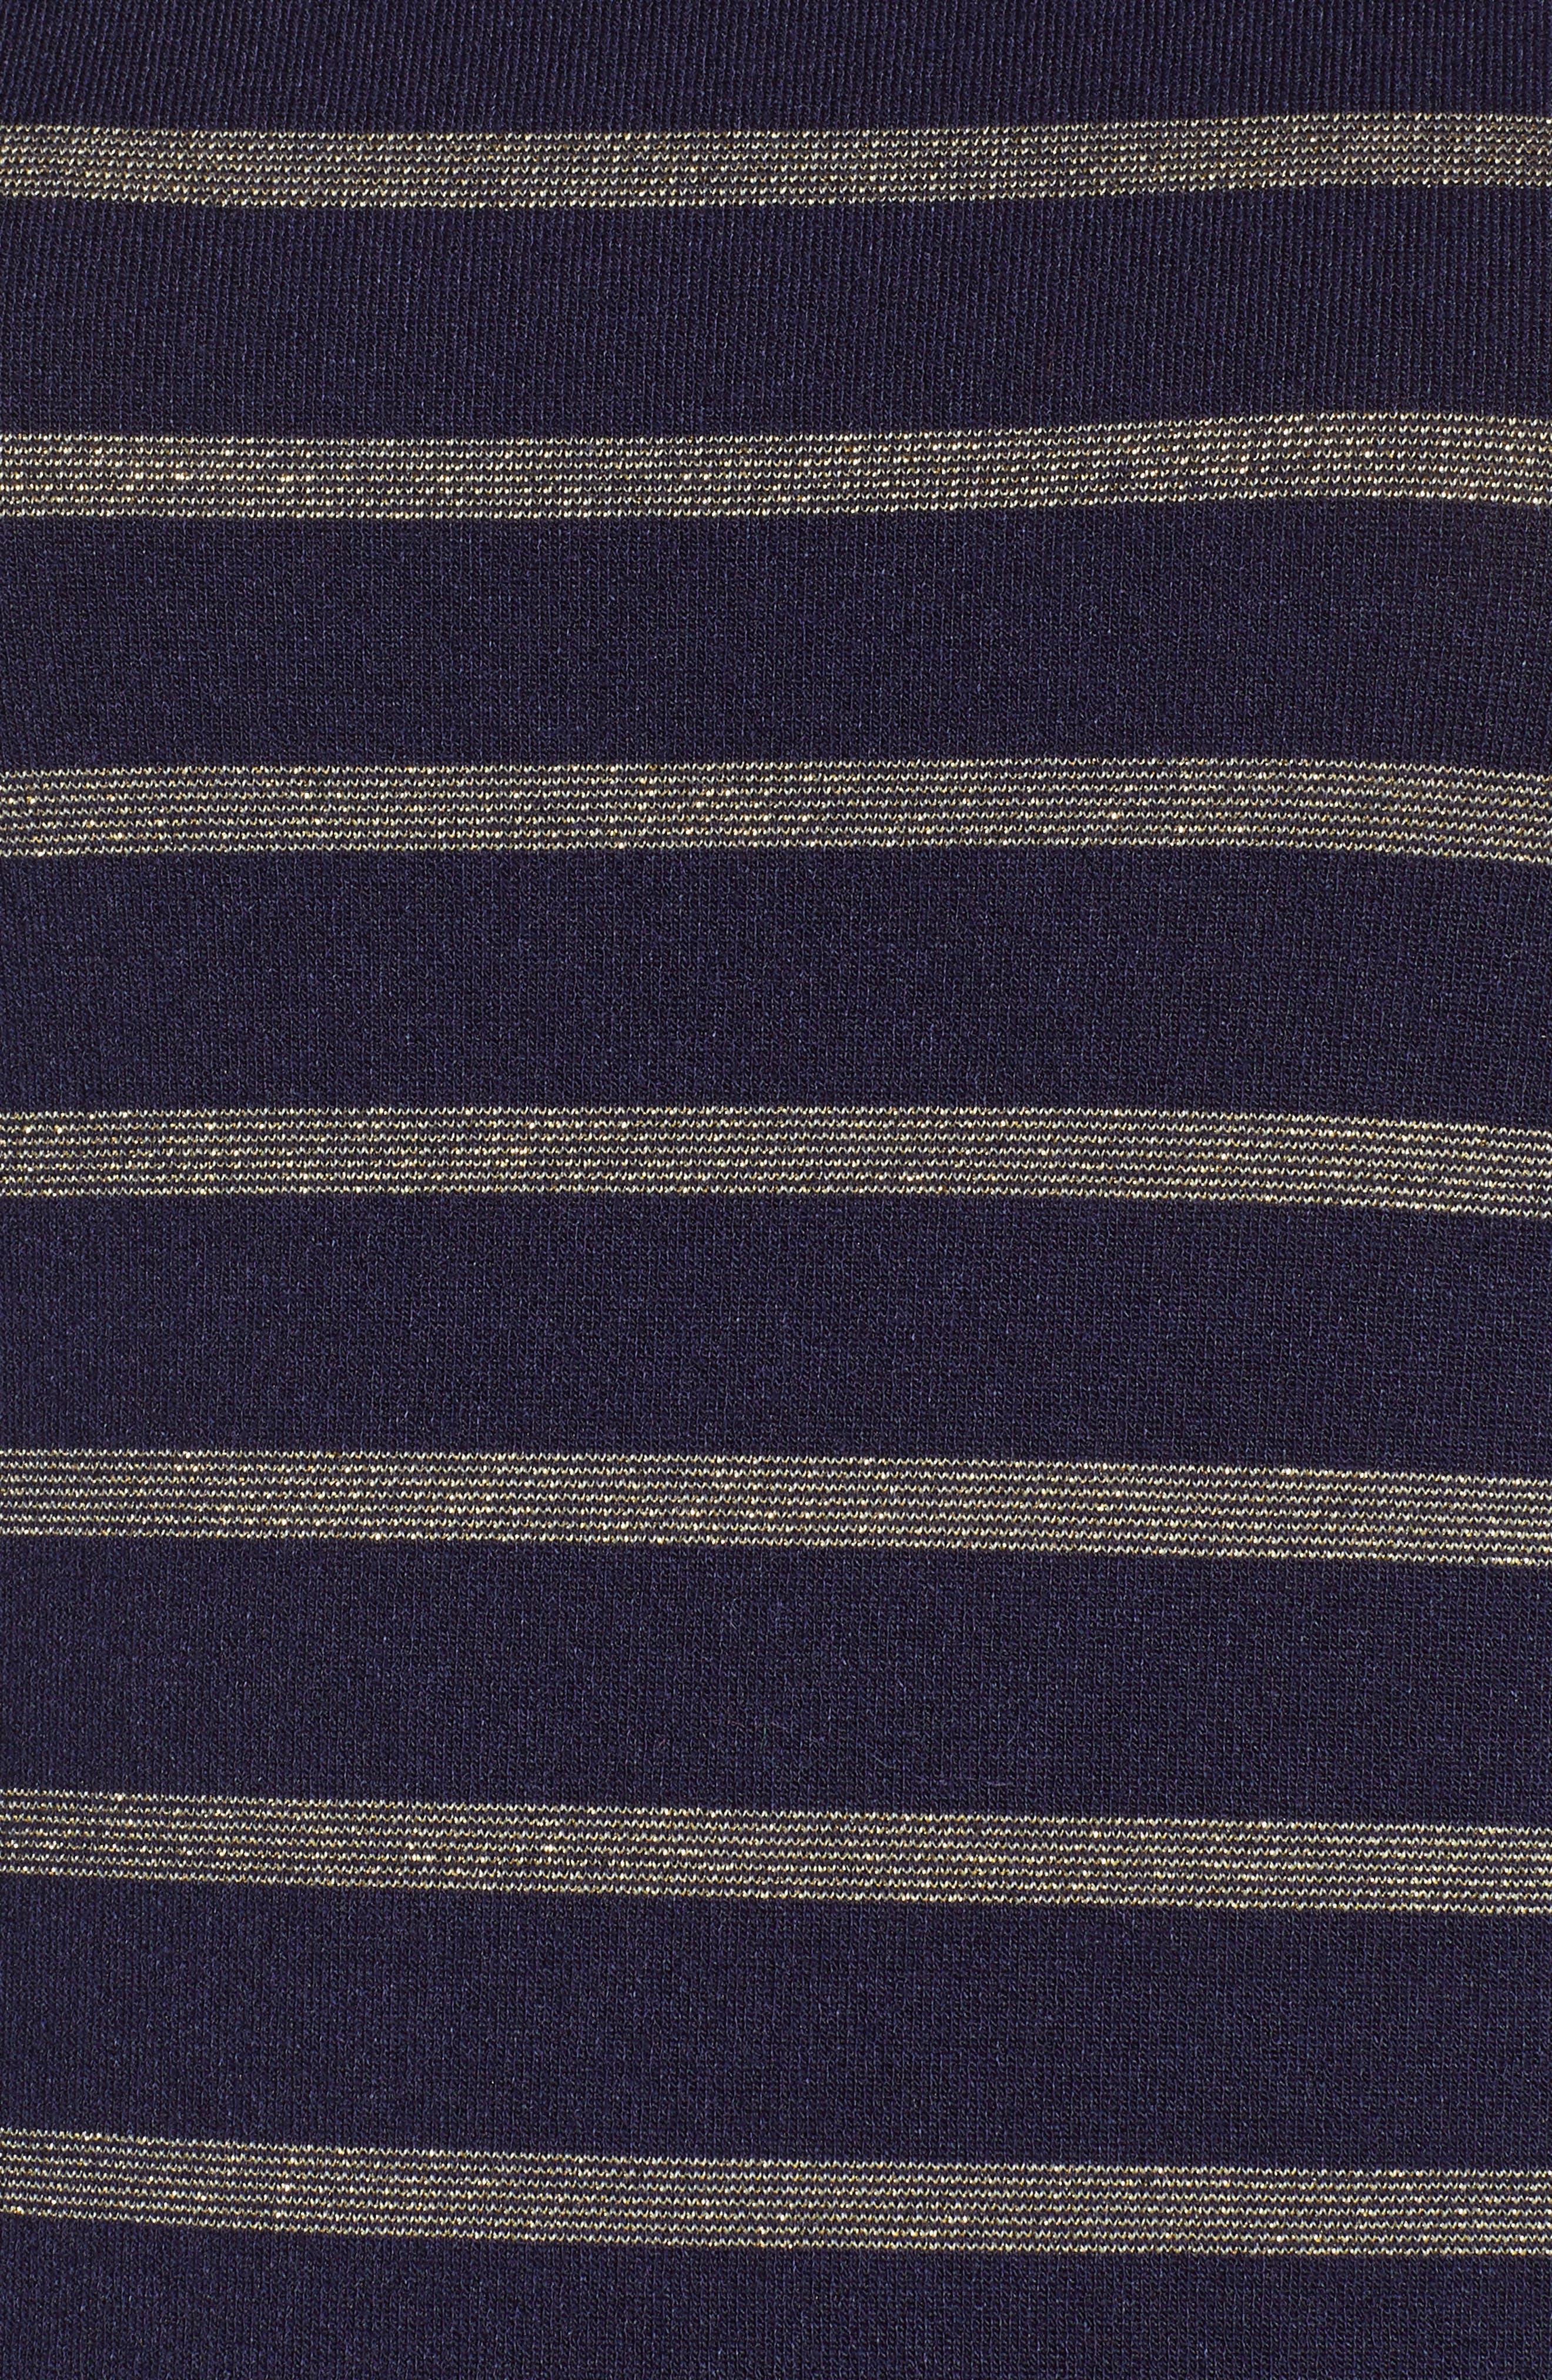 Metallic Stripe Turtleneck,                             Alternate thumbnail 5, color,                             NAVY- GOLD RIPPLE STRIPE